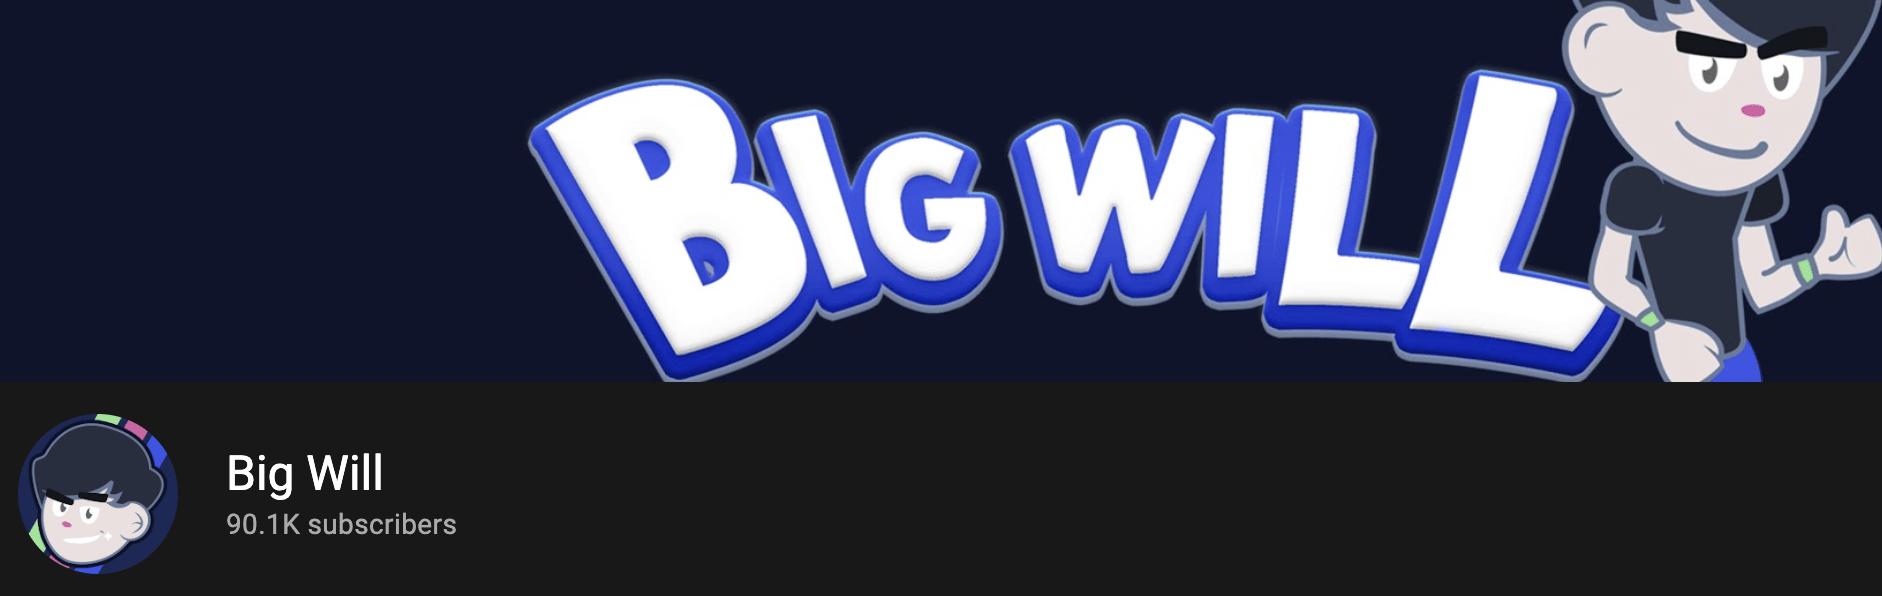 Big Will Banner